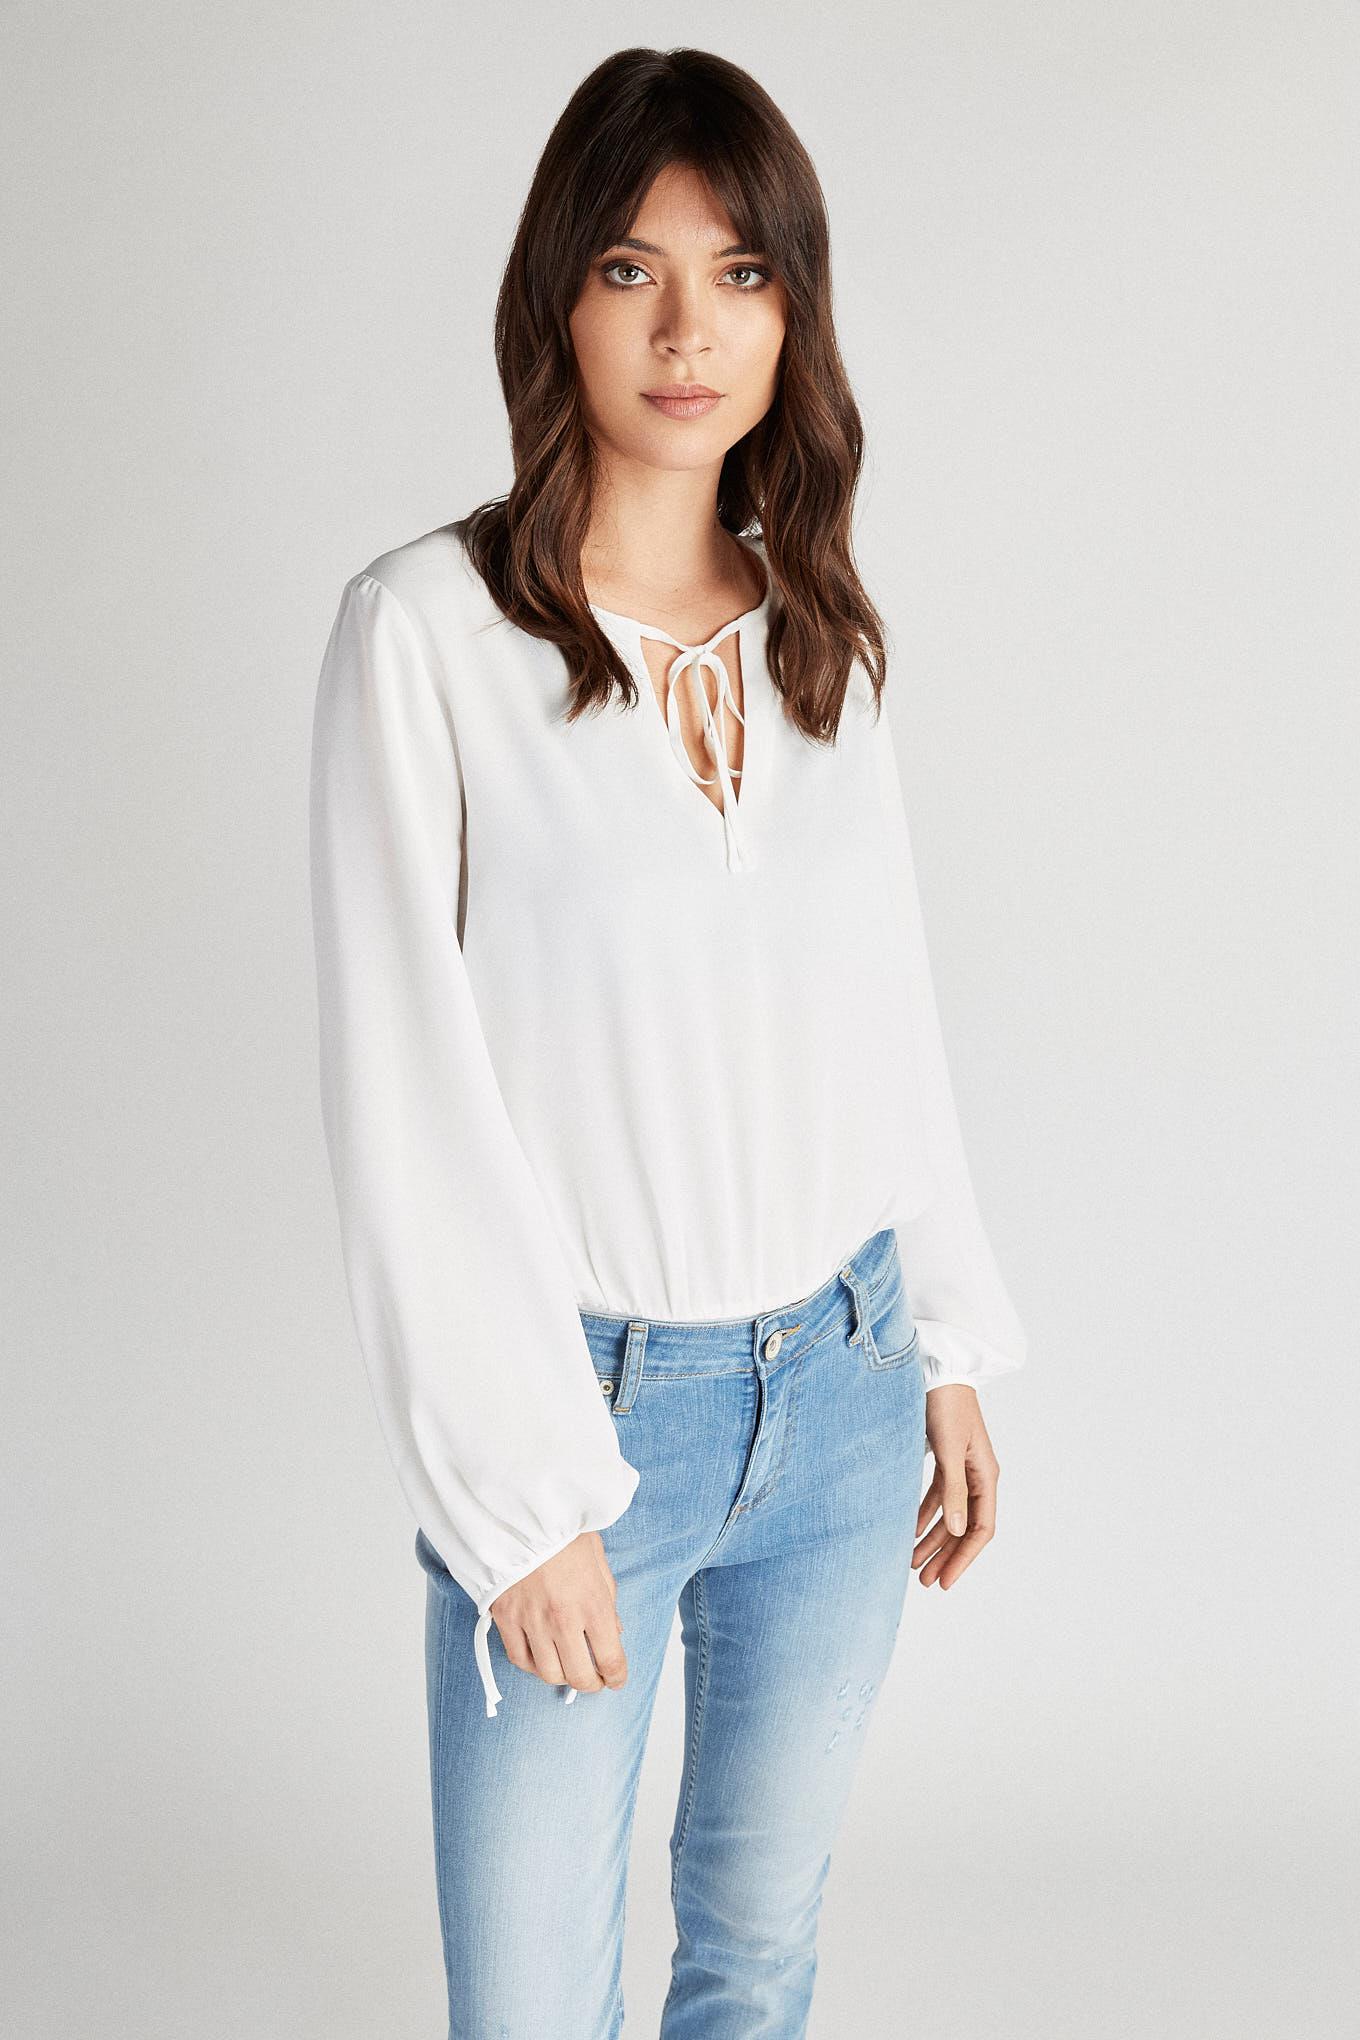 Blusa Branco Fantasy Mulher